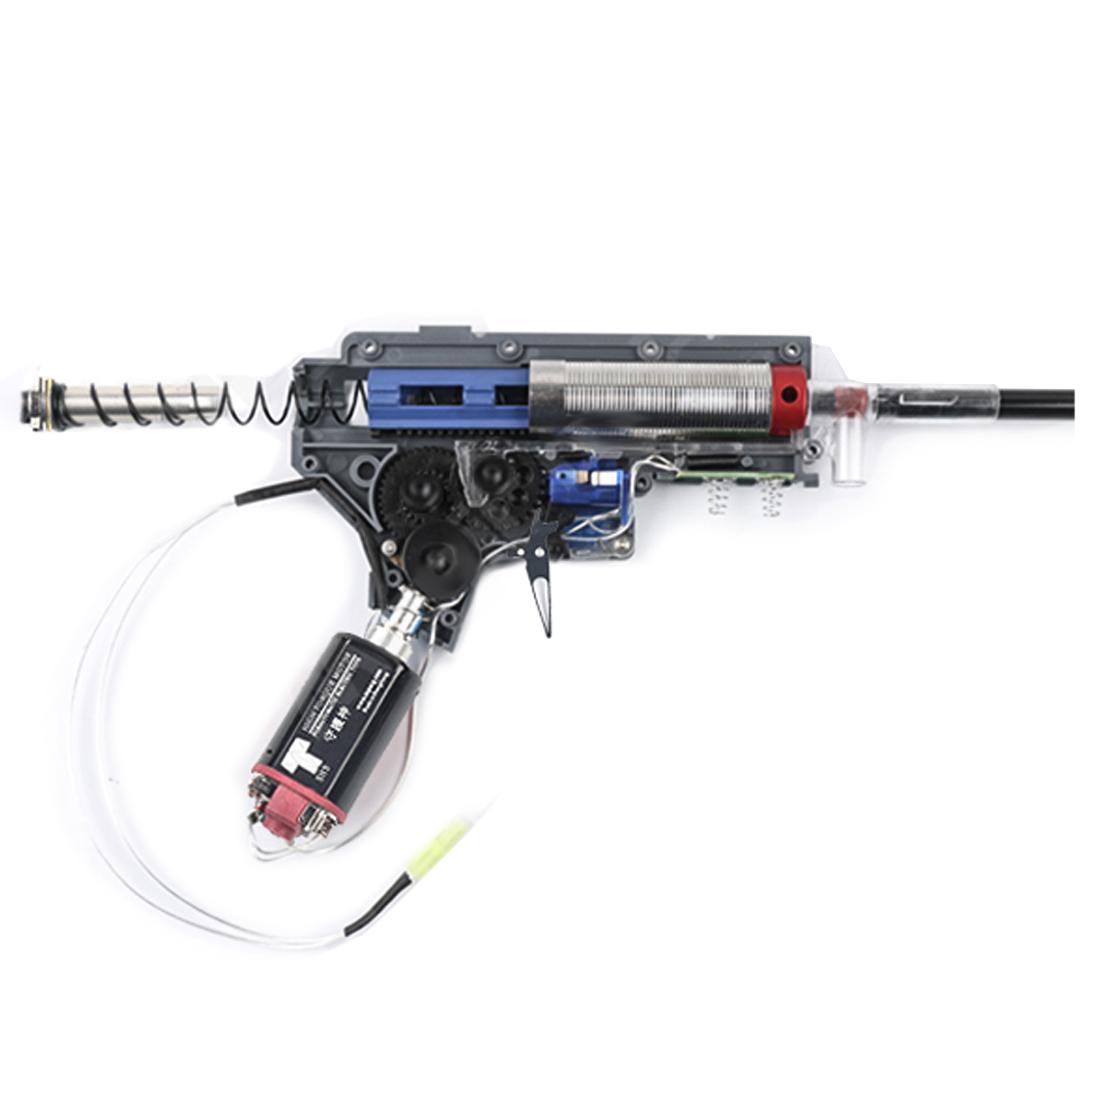 Upgraded Gearbox for KUBLIAI M4A1 Gel Gun Blaster